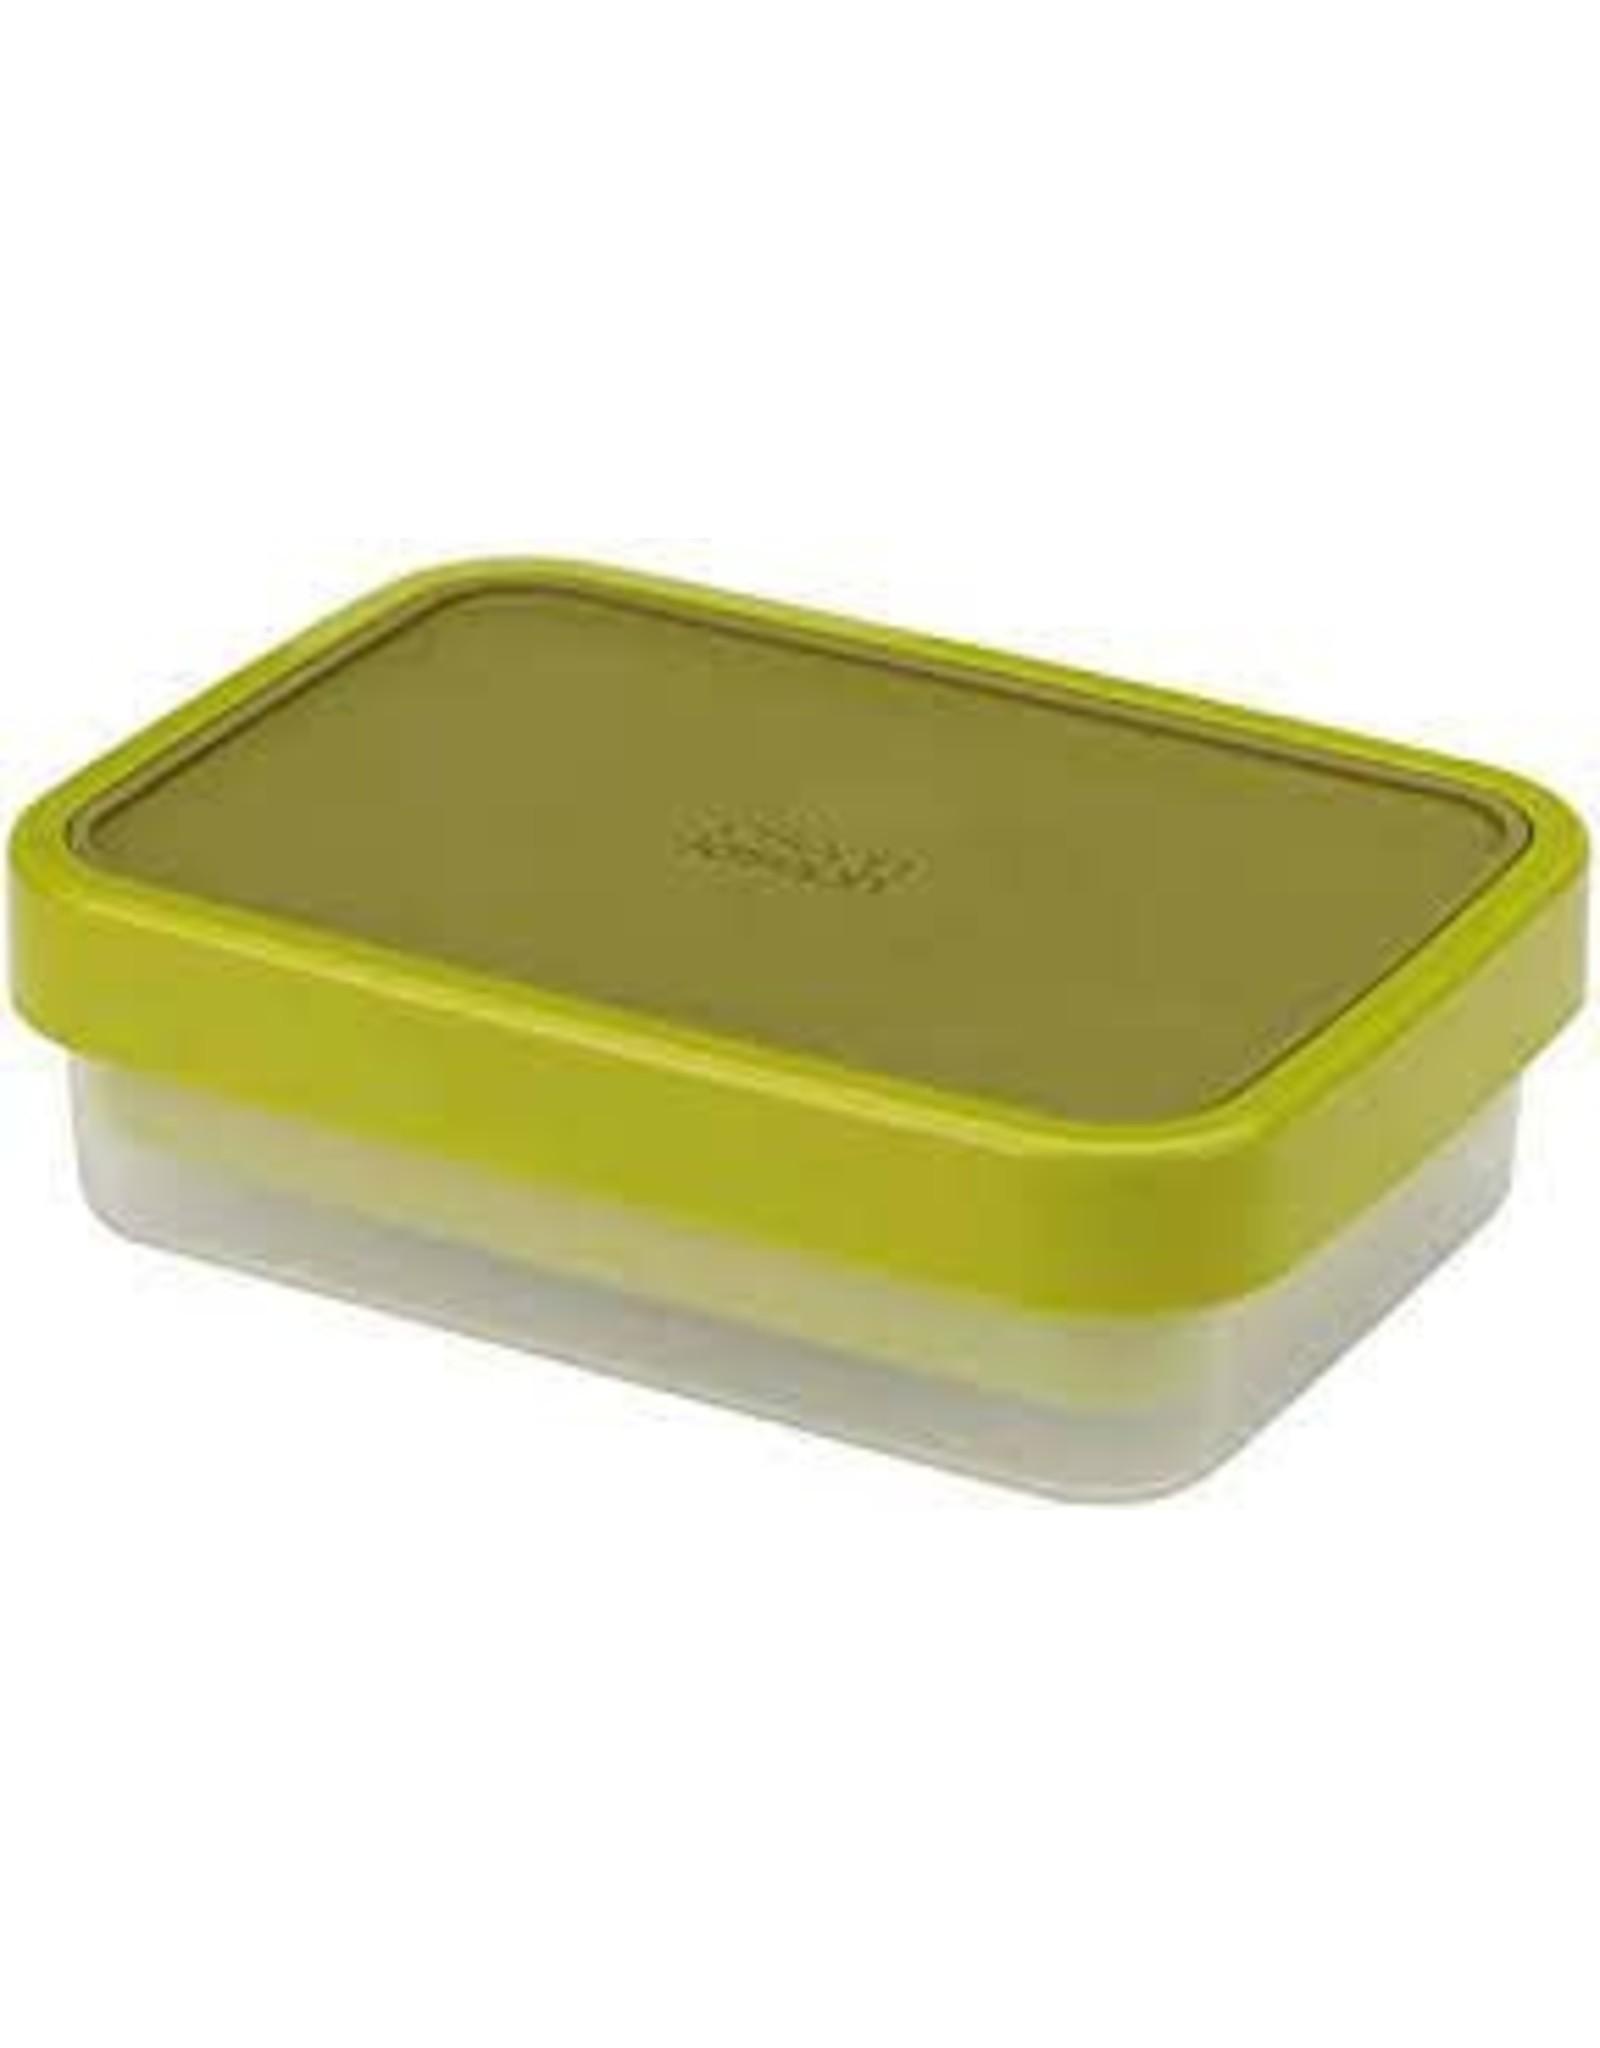 Joseph & Joseph Go Eat Lunch box - Green